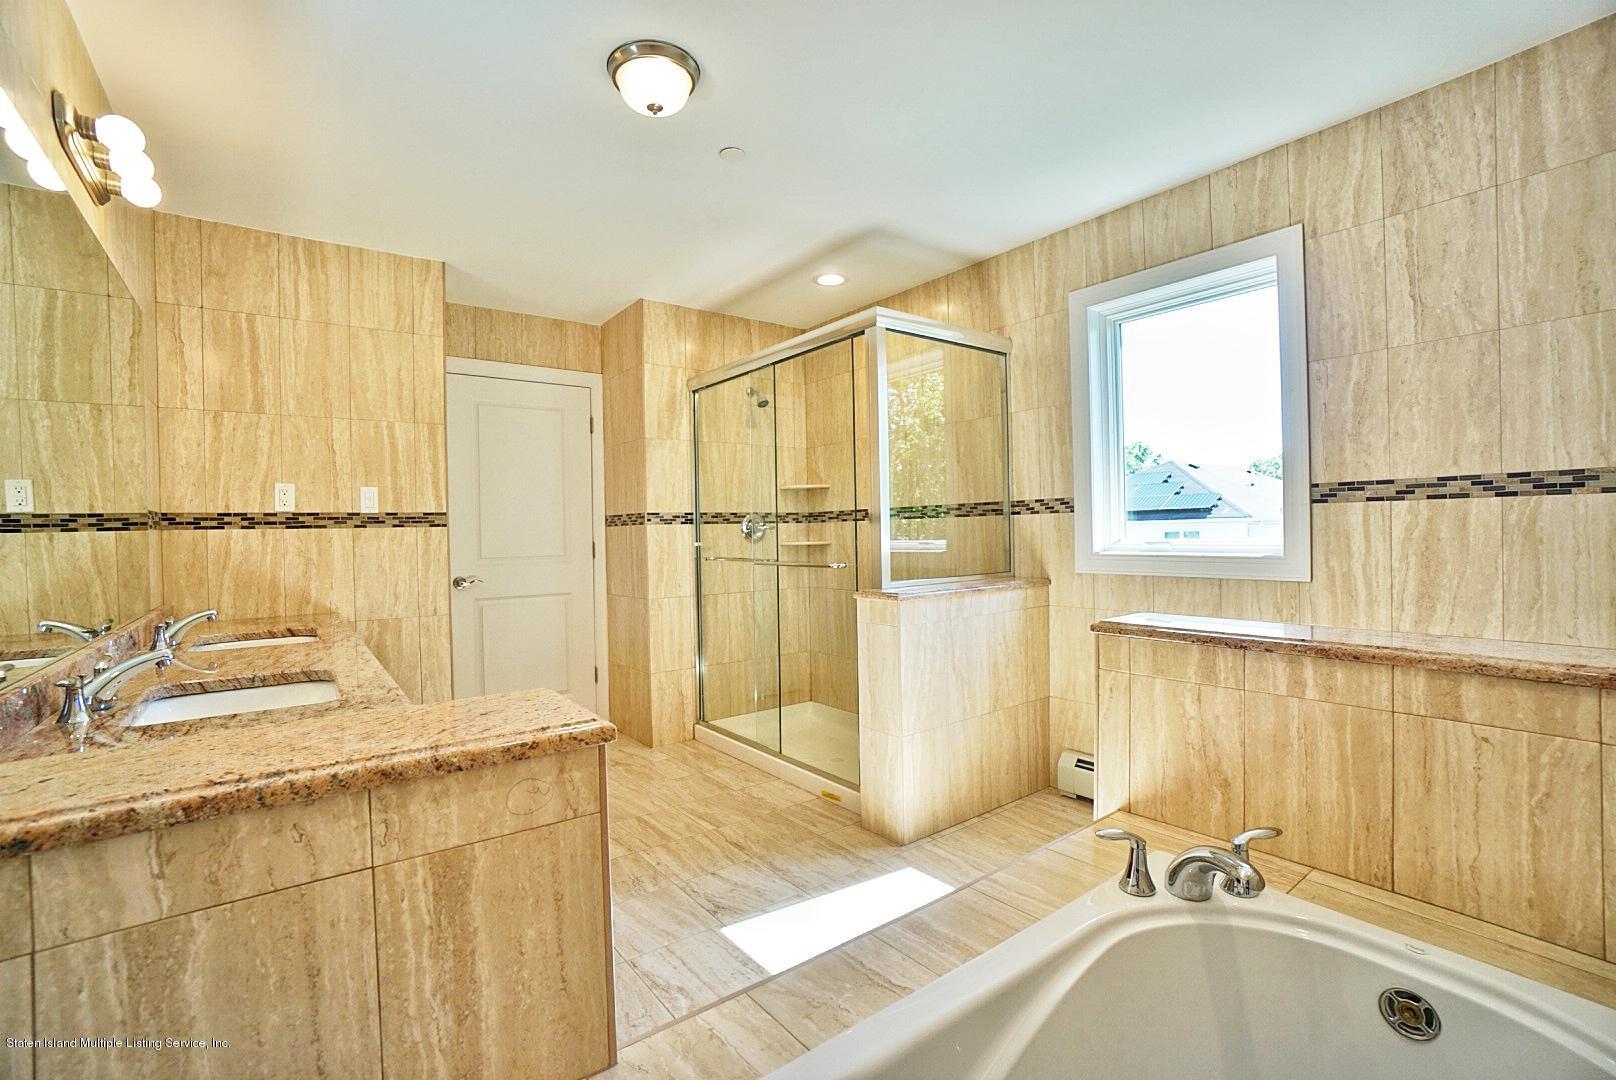 Single Family - Detached 678 Yetman Avenue  Staten Island, NY 10307, MLS-1132766-57